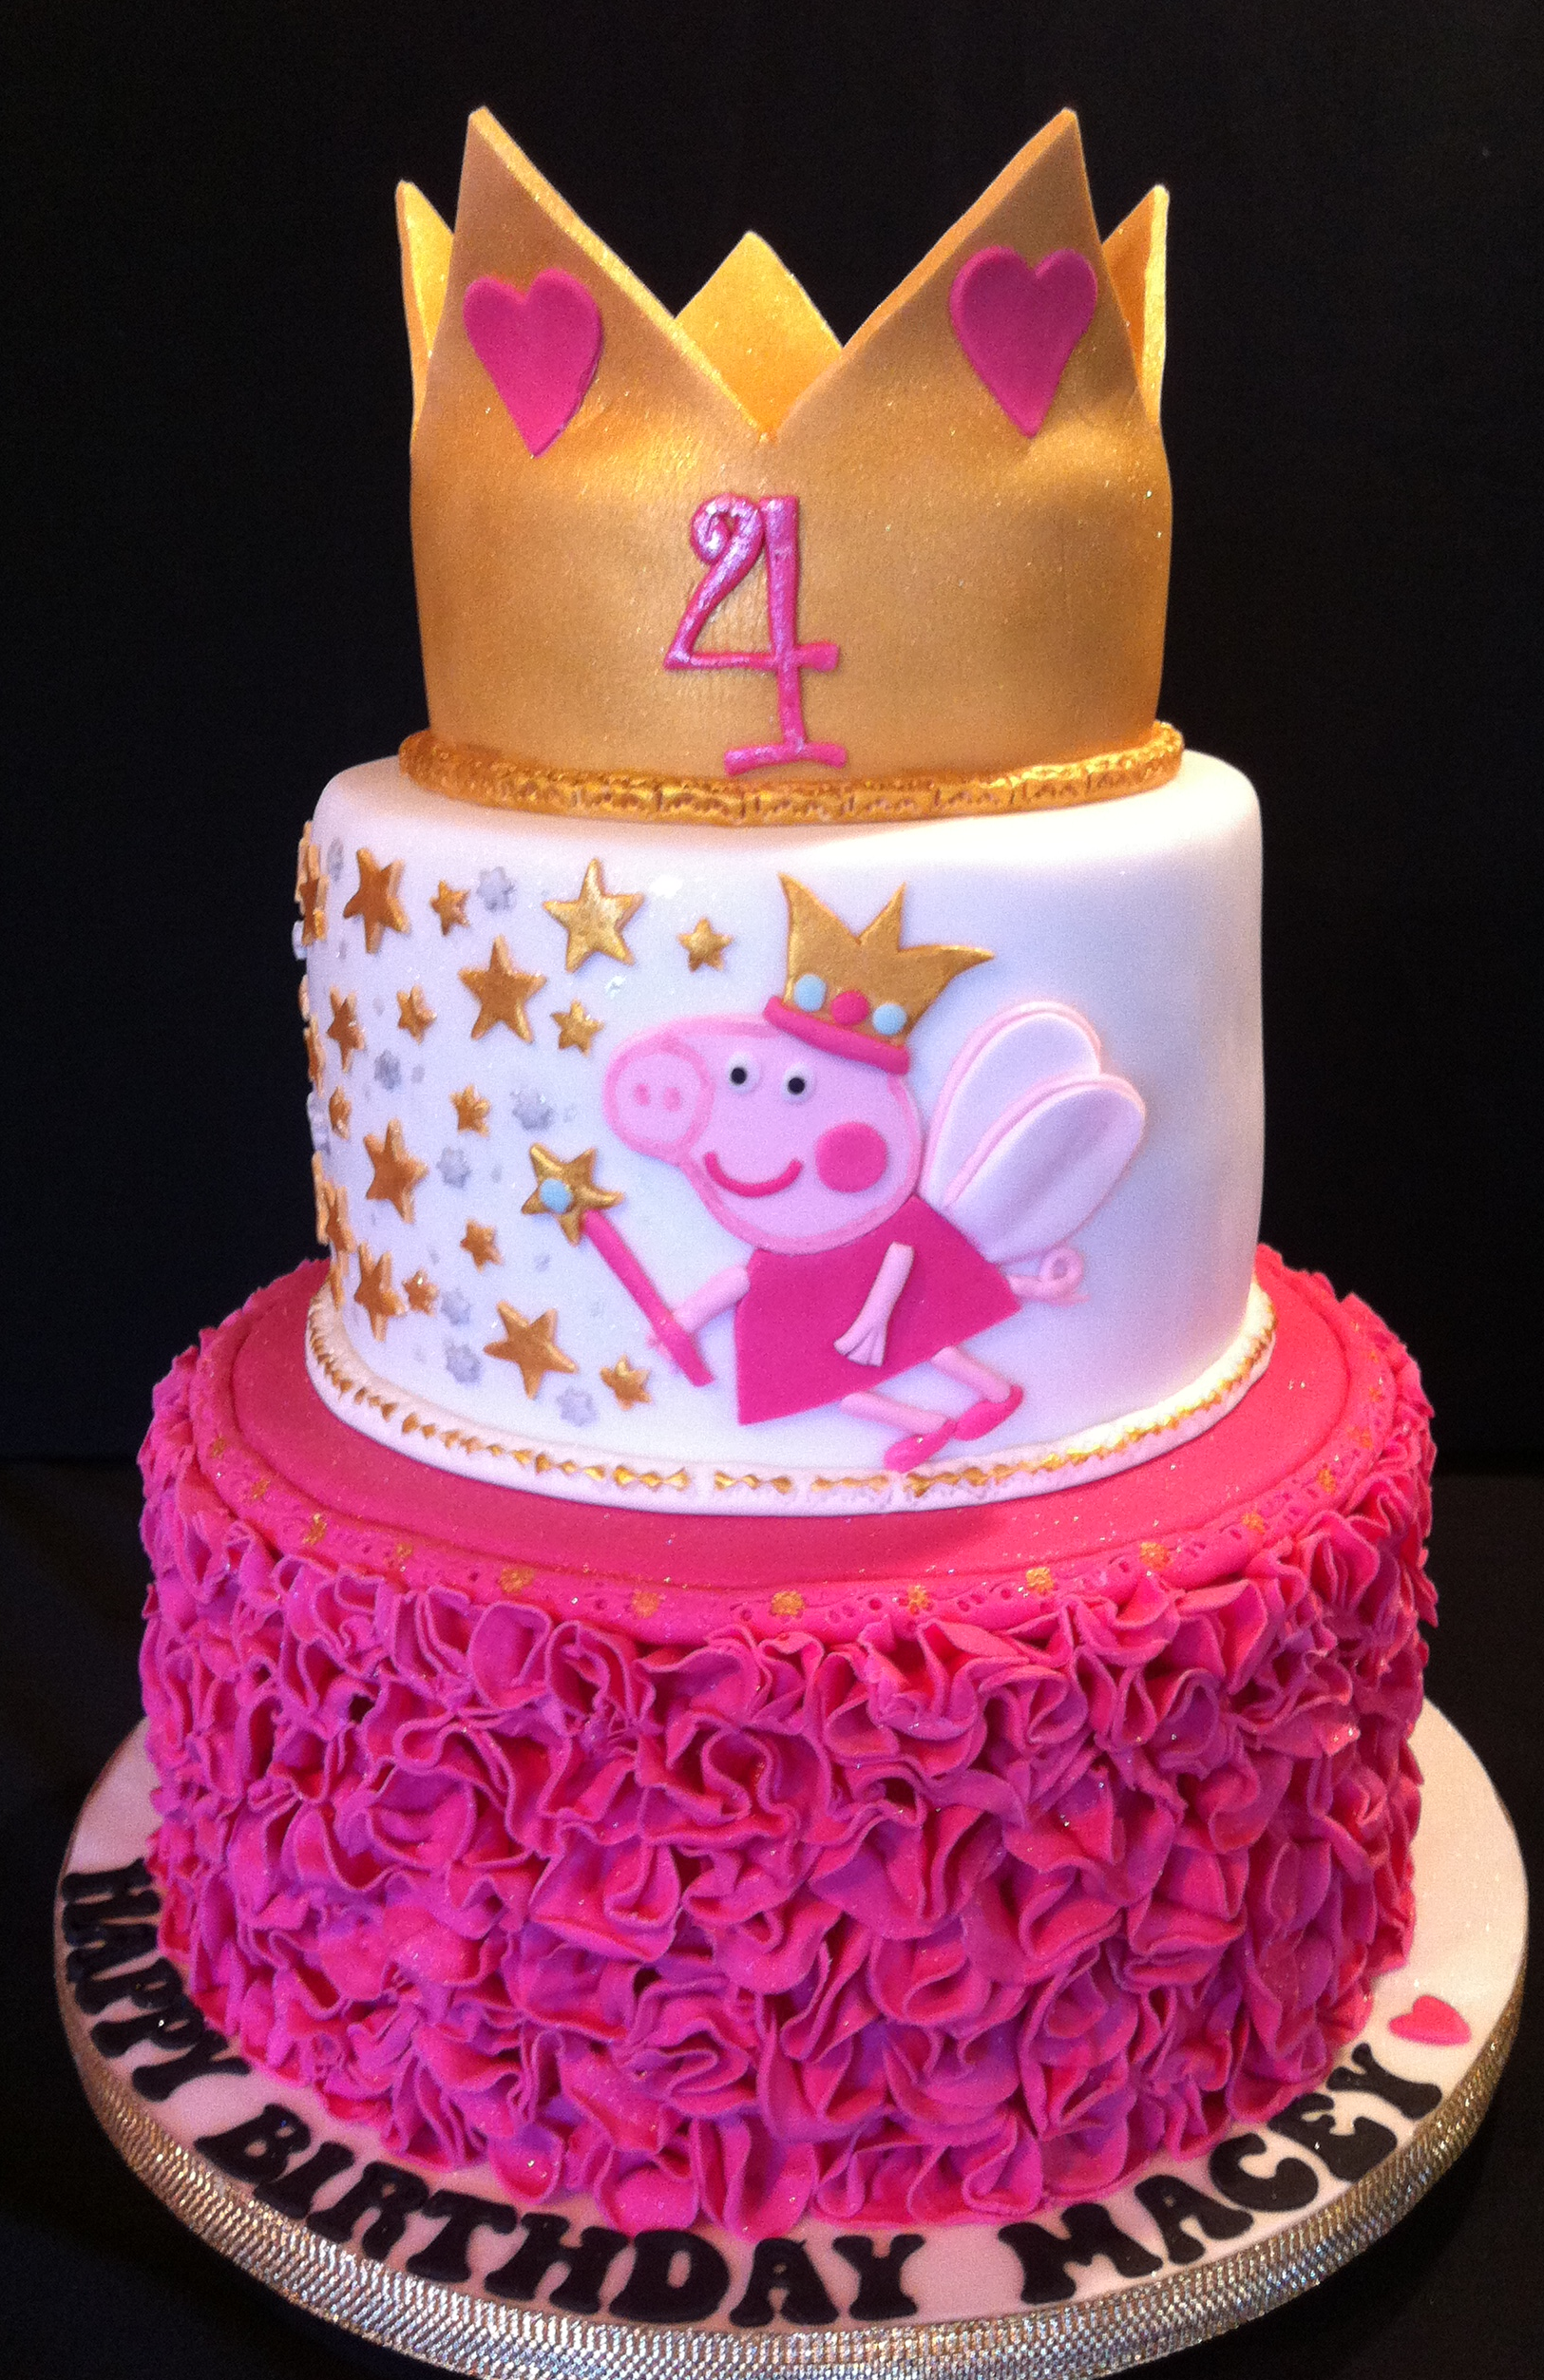 Peppa pig princess cake | Brelynn 4 | Pinterest | Princess, Cake and ...